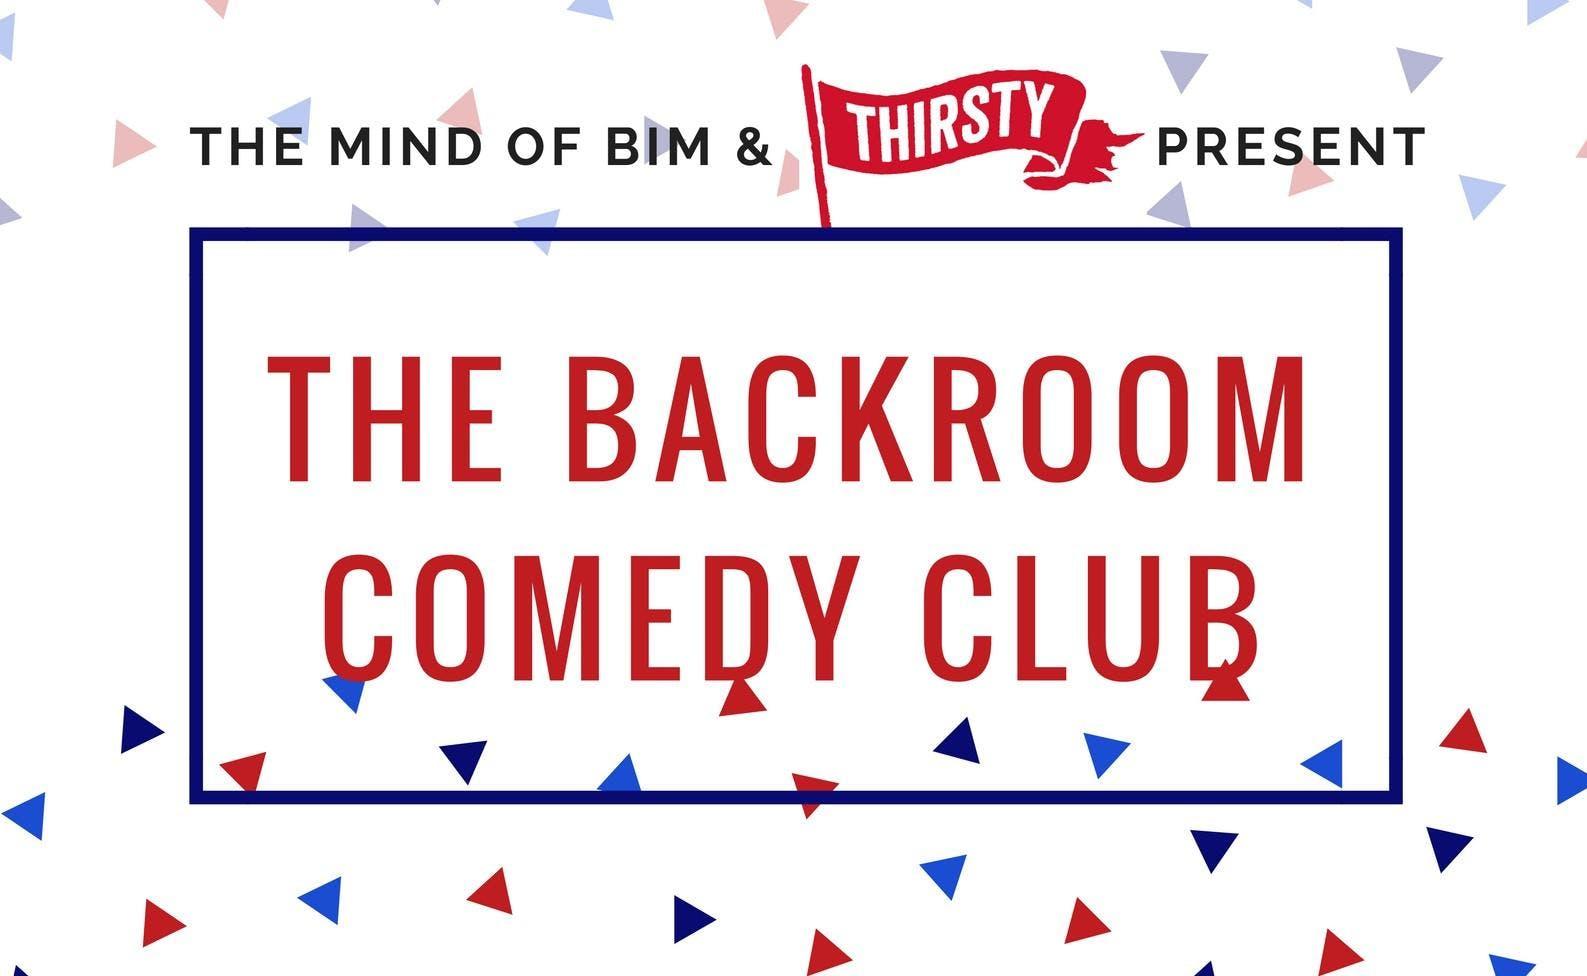 The Backroom Comedy Club - Presented by Bim a